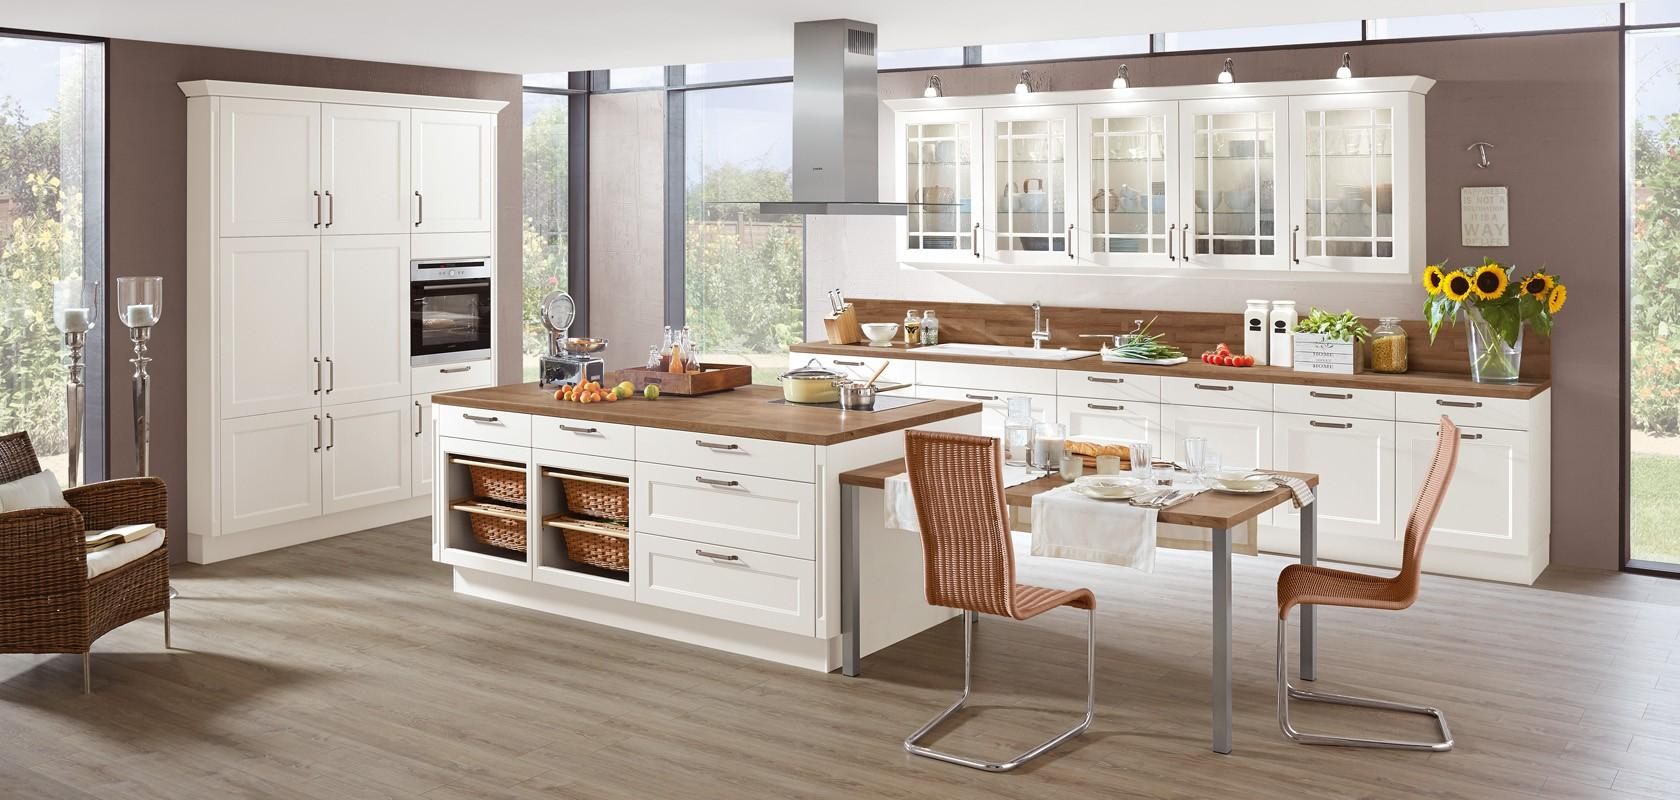 Moderna kuhinja rustikalnega izgleda